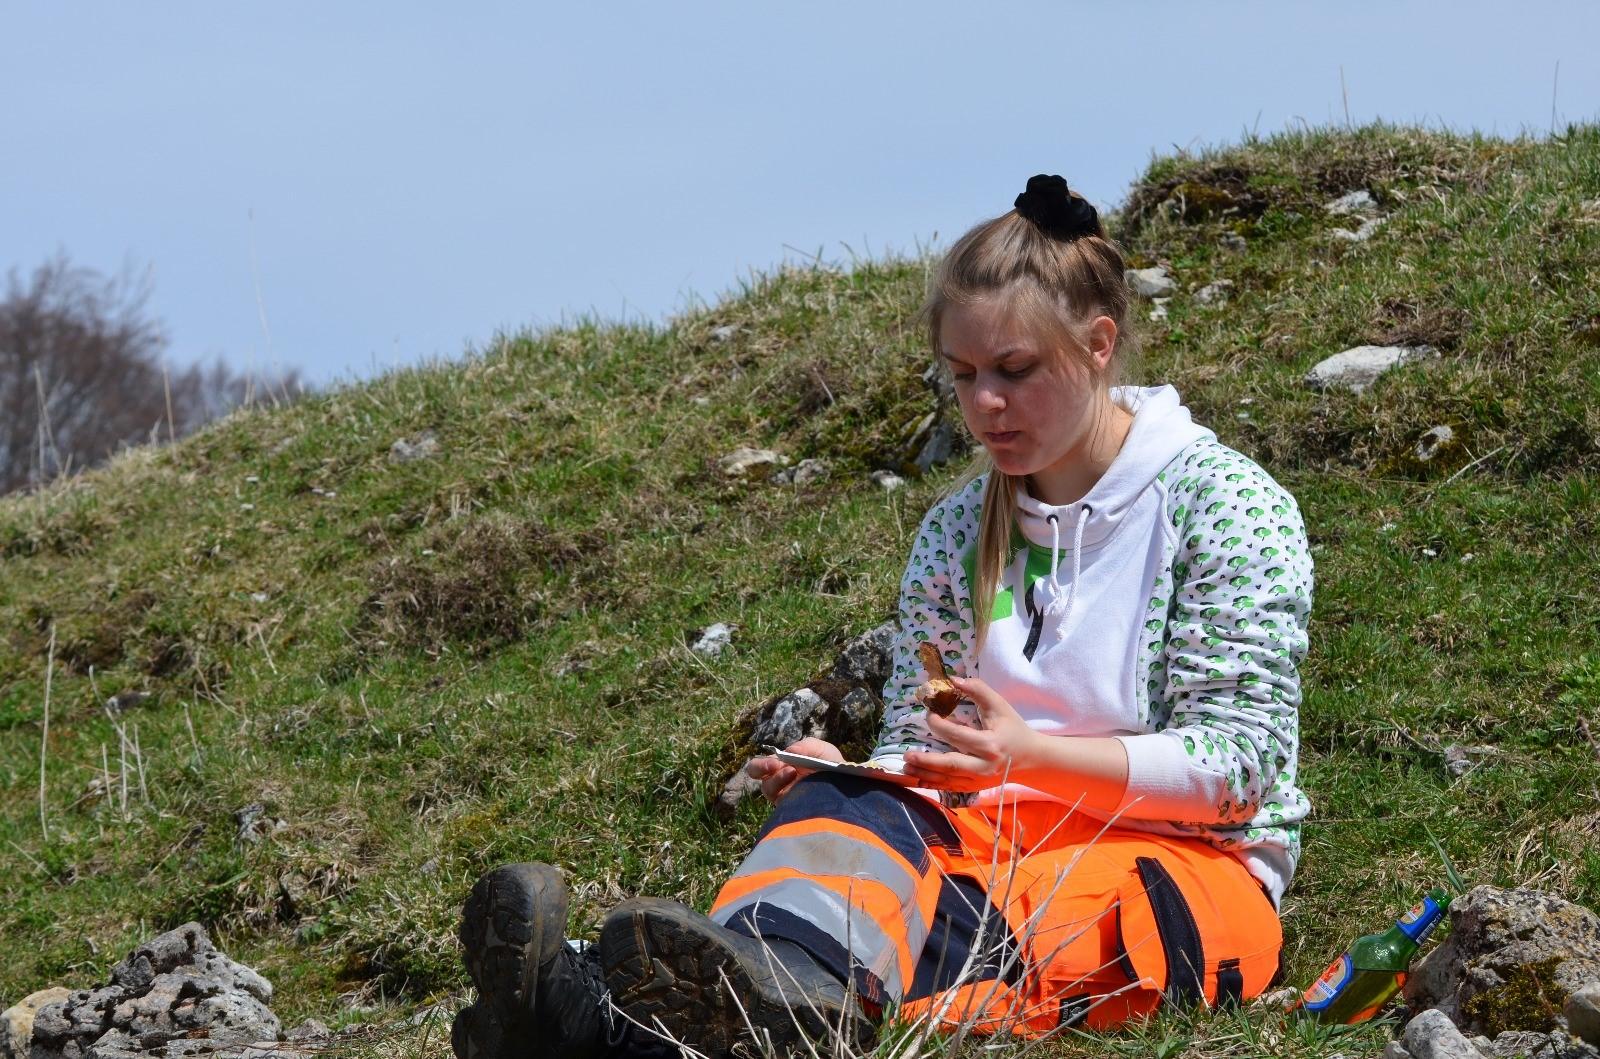 Feldpraktikum im Bachelor-Studium Geomatik an der FHNW.